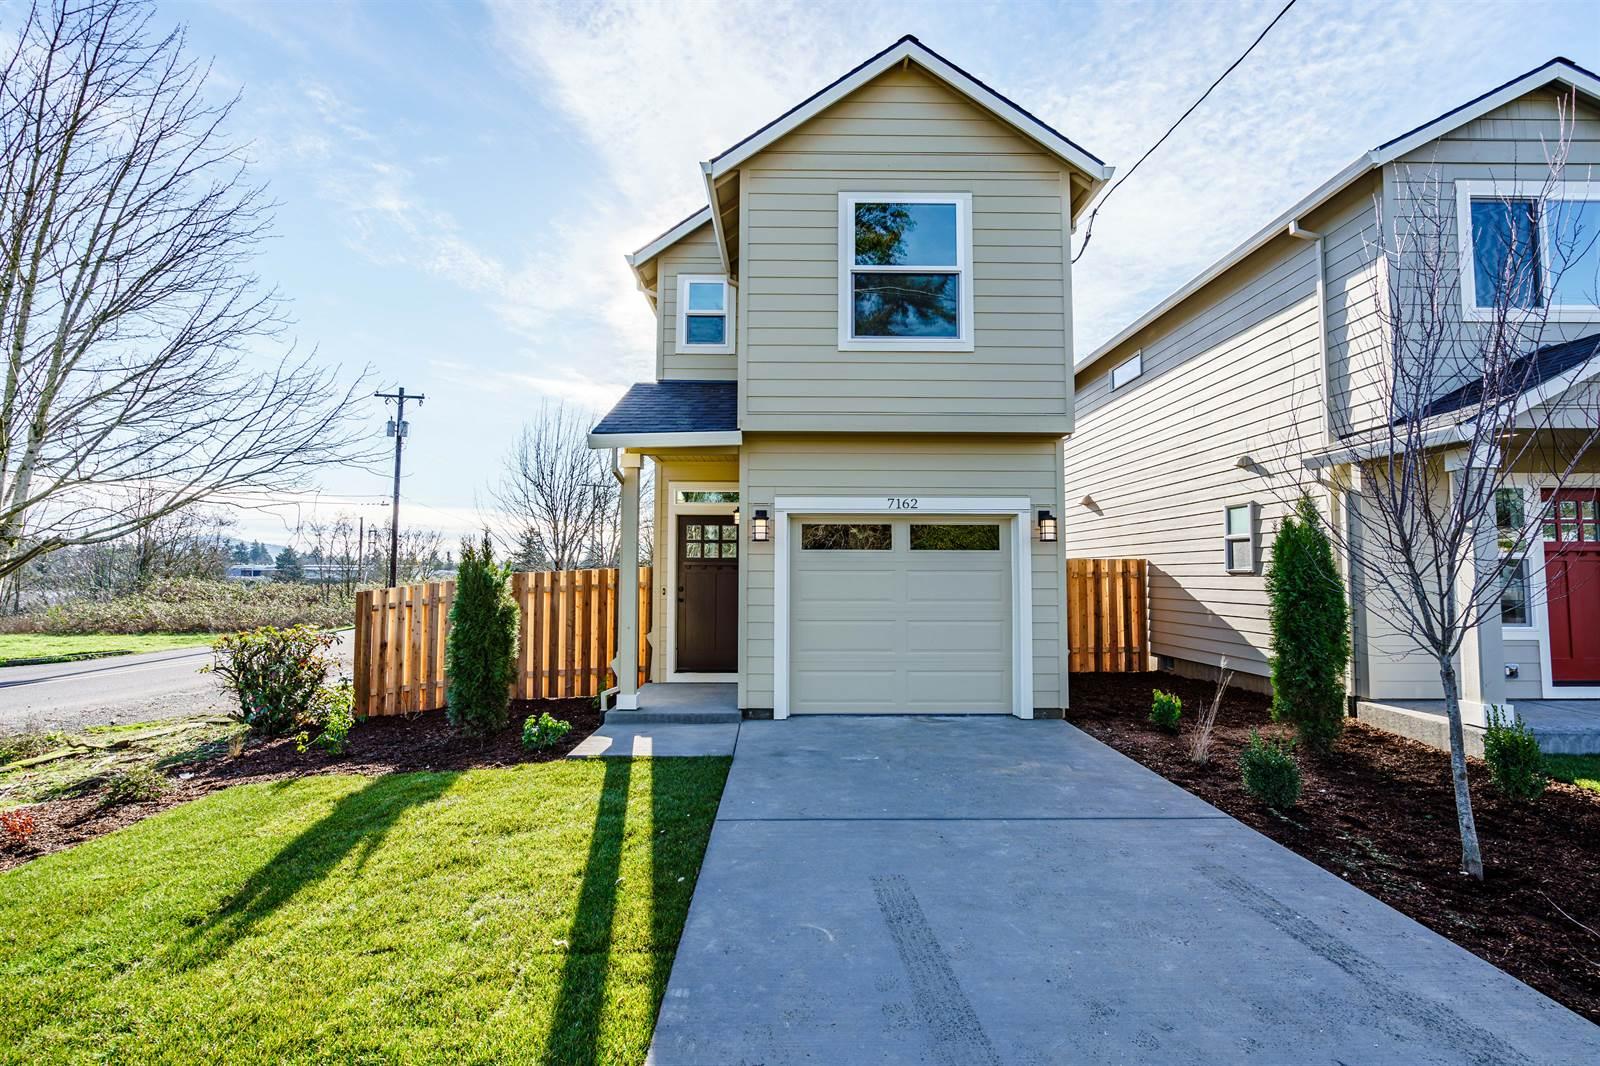 7162 Se Fern St., Portland, OR 97206